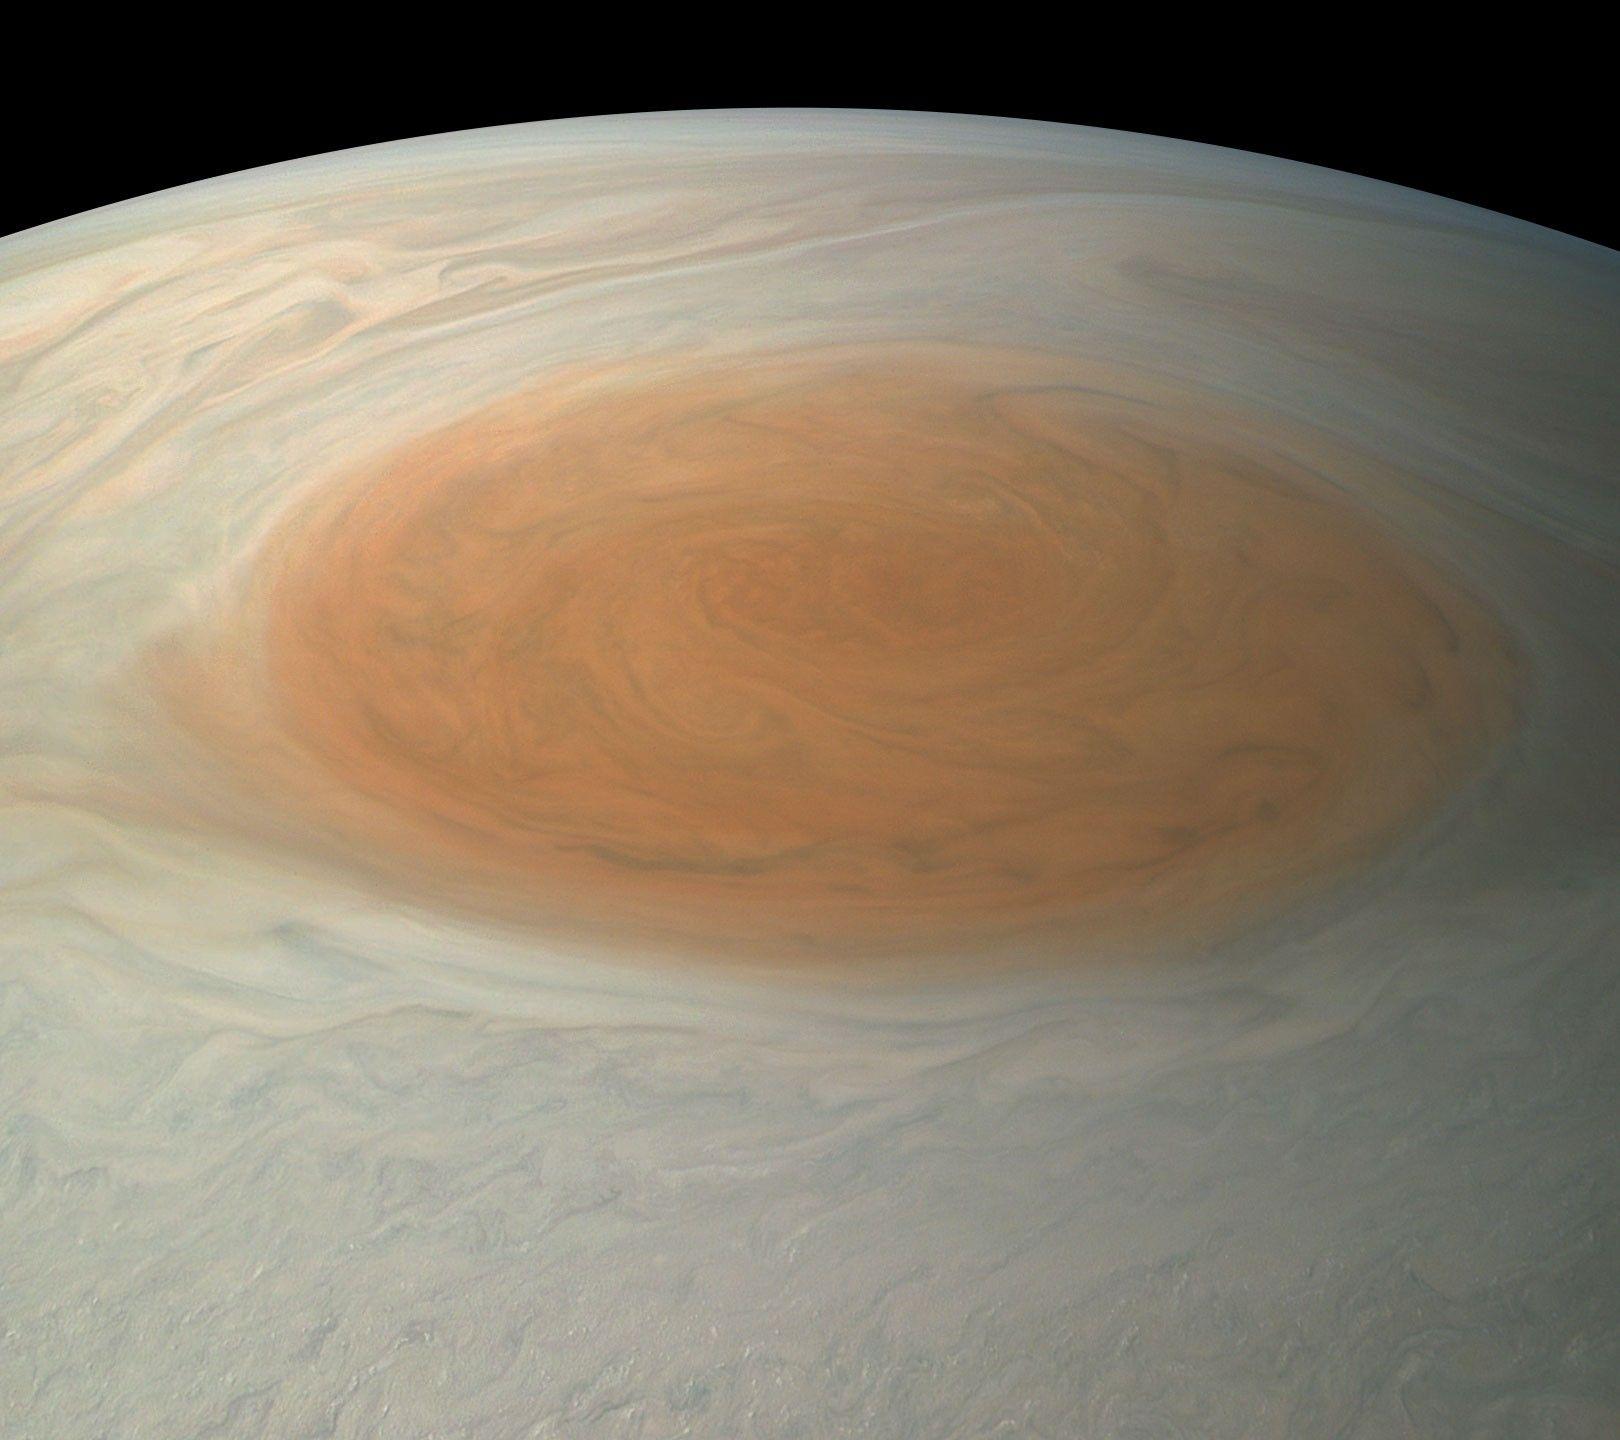 La grande tache rouge de Jupiter va-t-elle disparaître ?